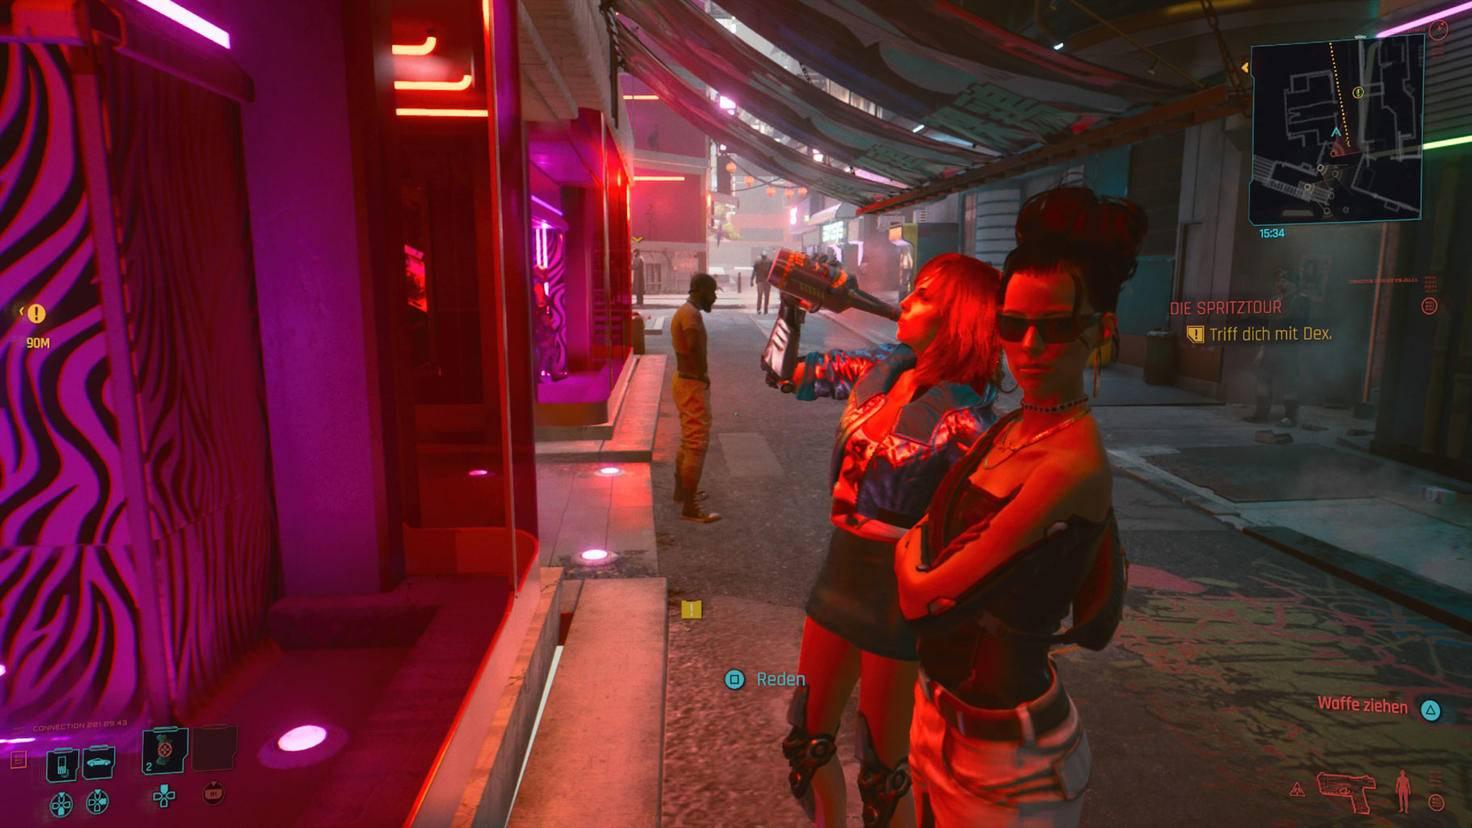 cyberpunk-2077-ps5-screenshot-06